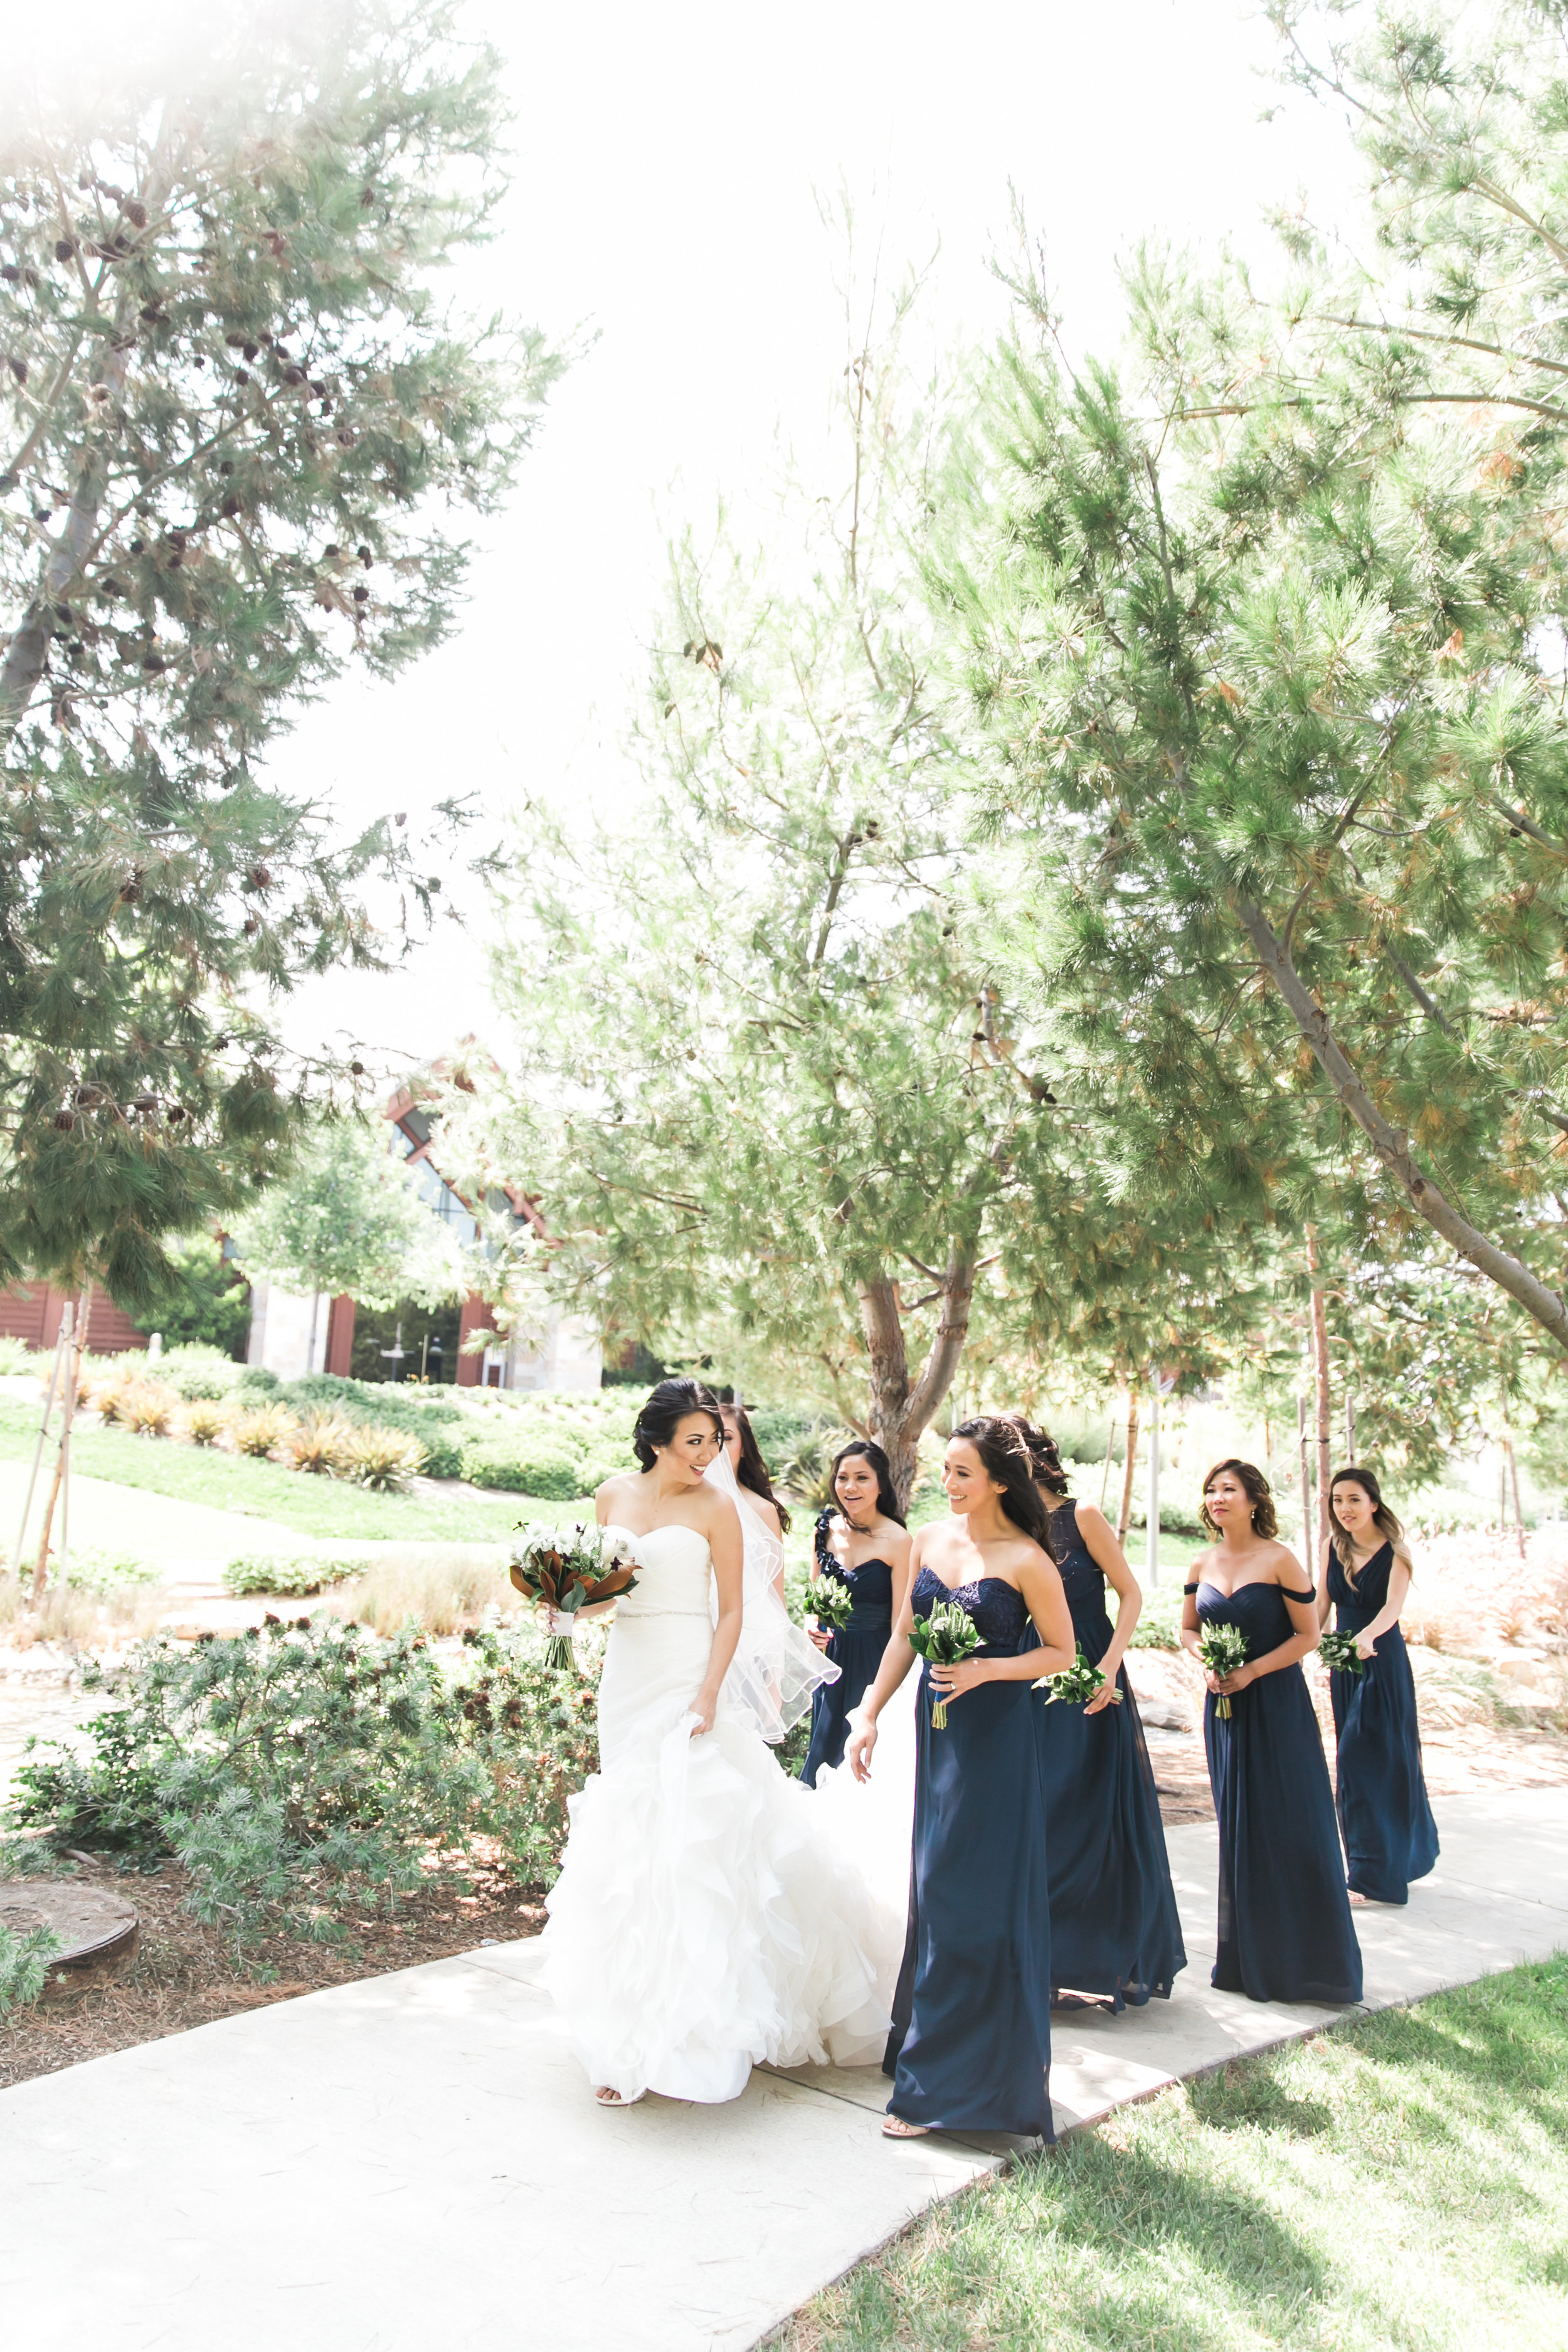 Frank&Melissa'swedding-29.jpg